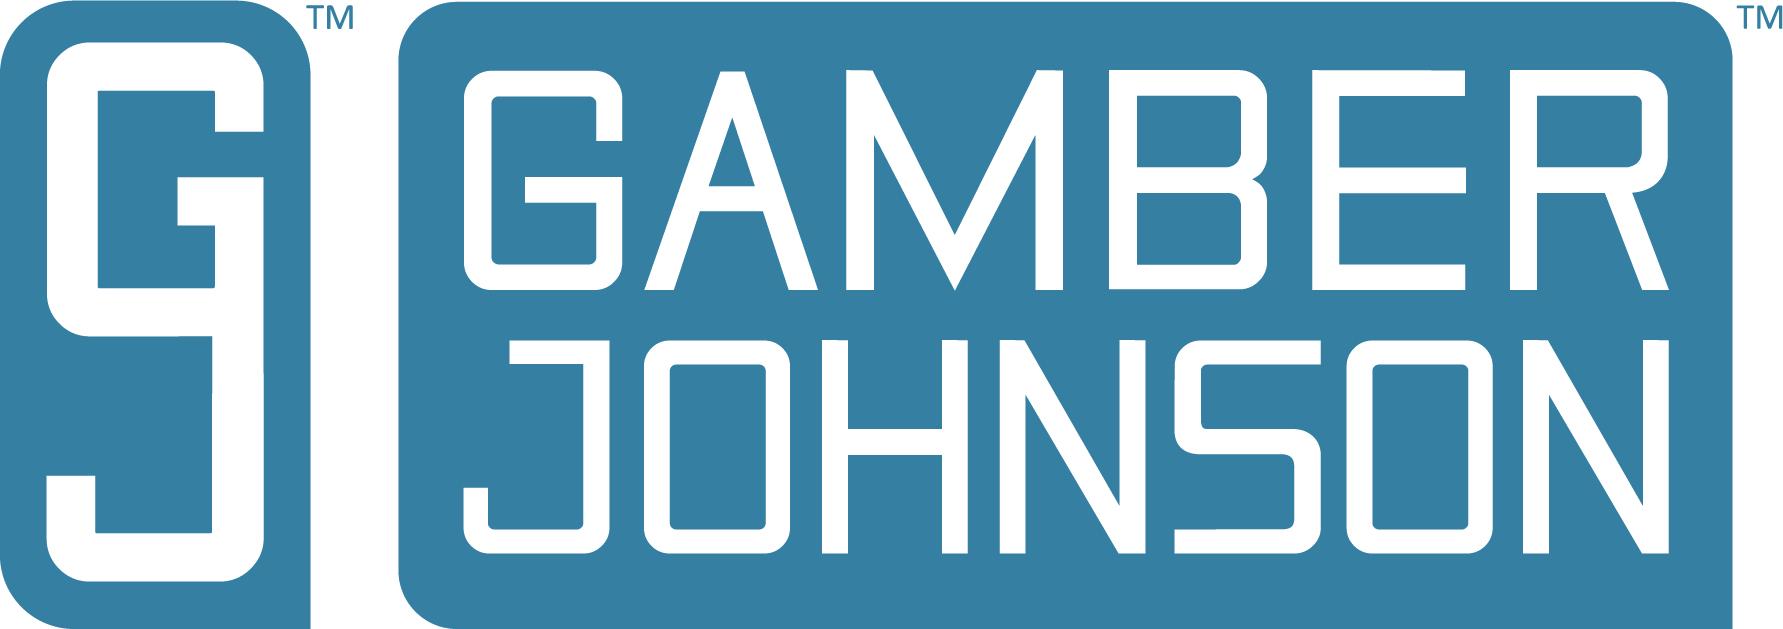 gamber johnson and ingram micro announce distribution partnership rh newswire com Gamber-Johnson Sprinter Gamber-Johnson Sprinter